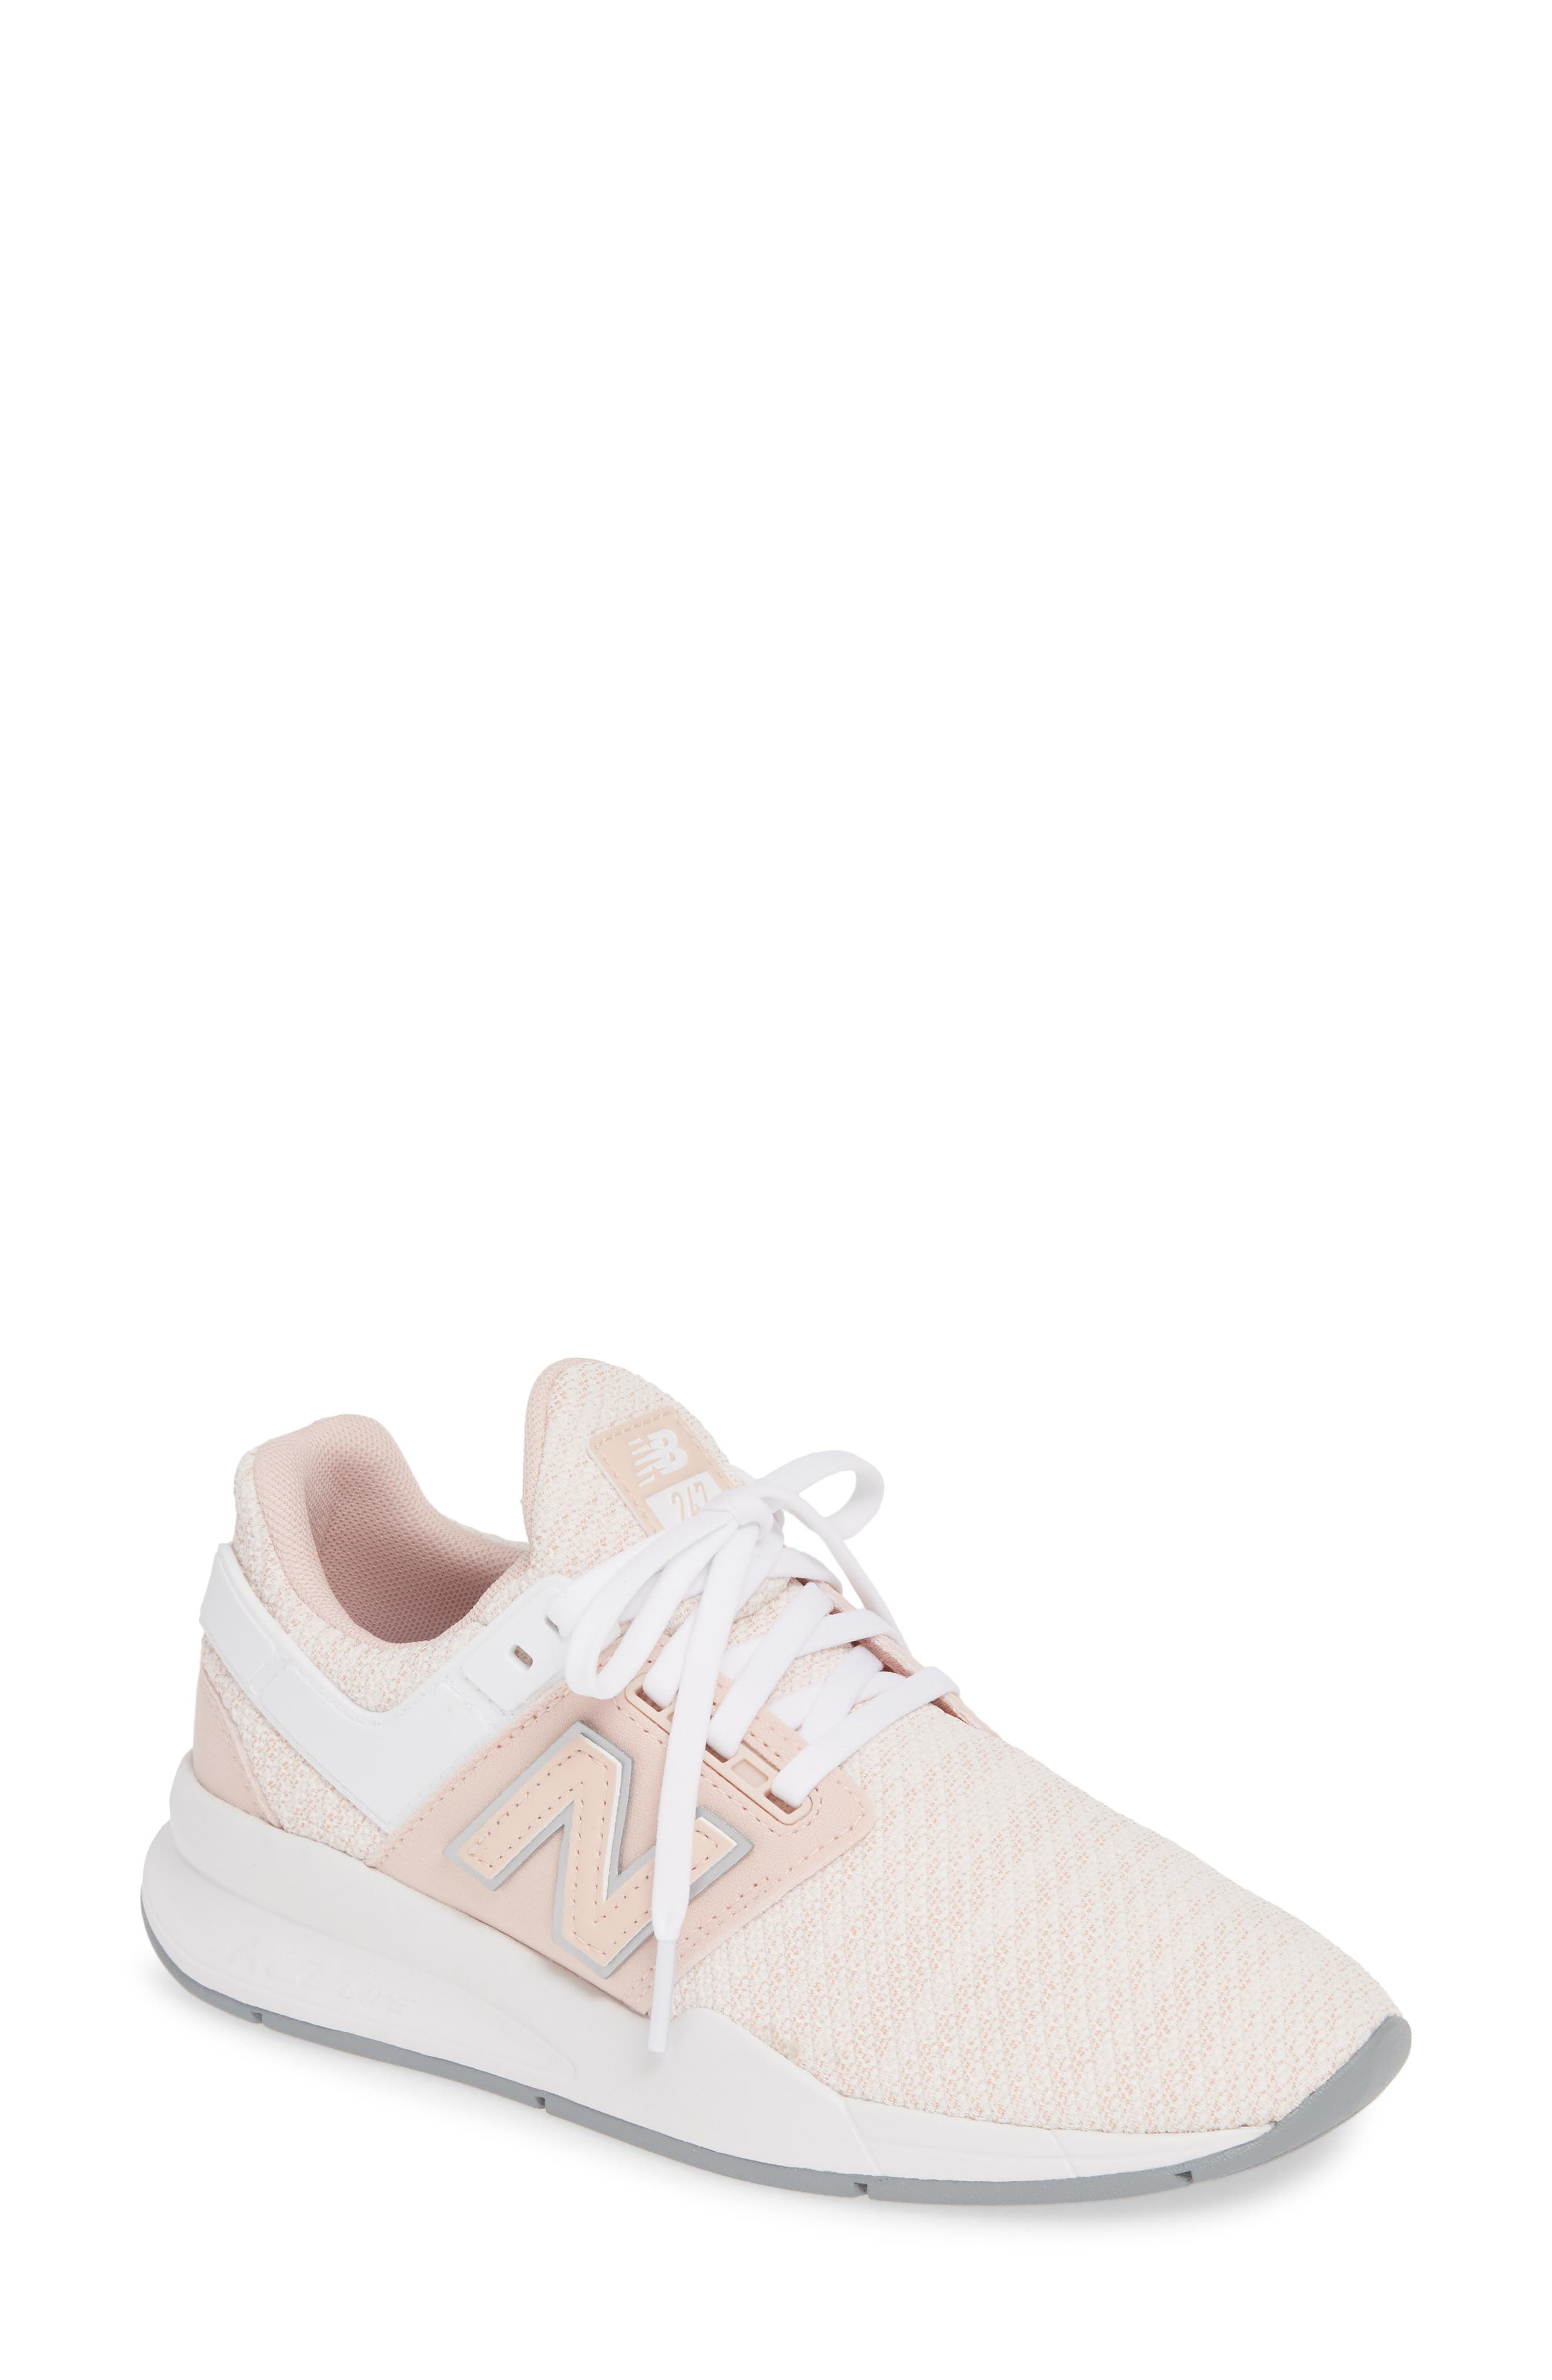 New Balance 247 Sneaker B - Pink